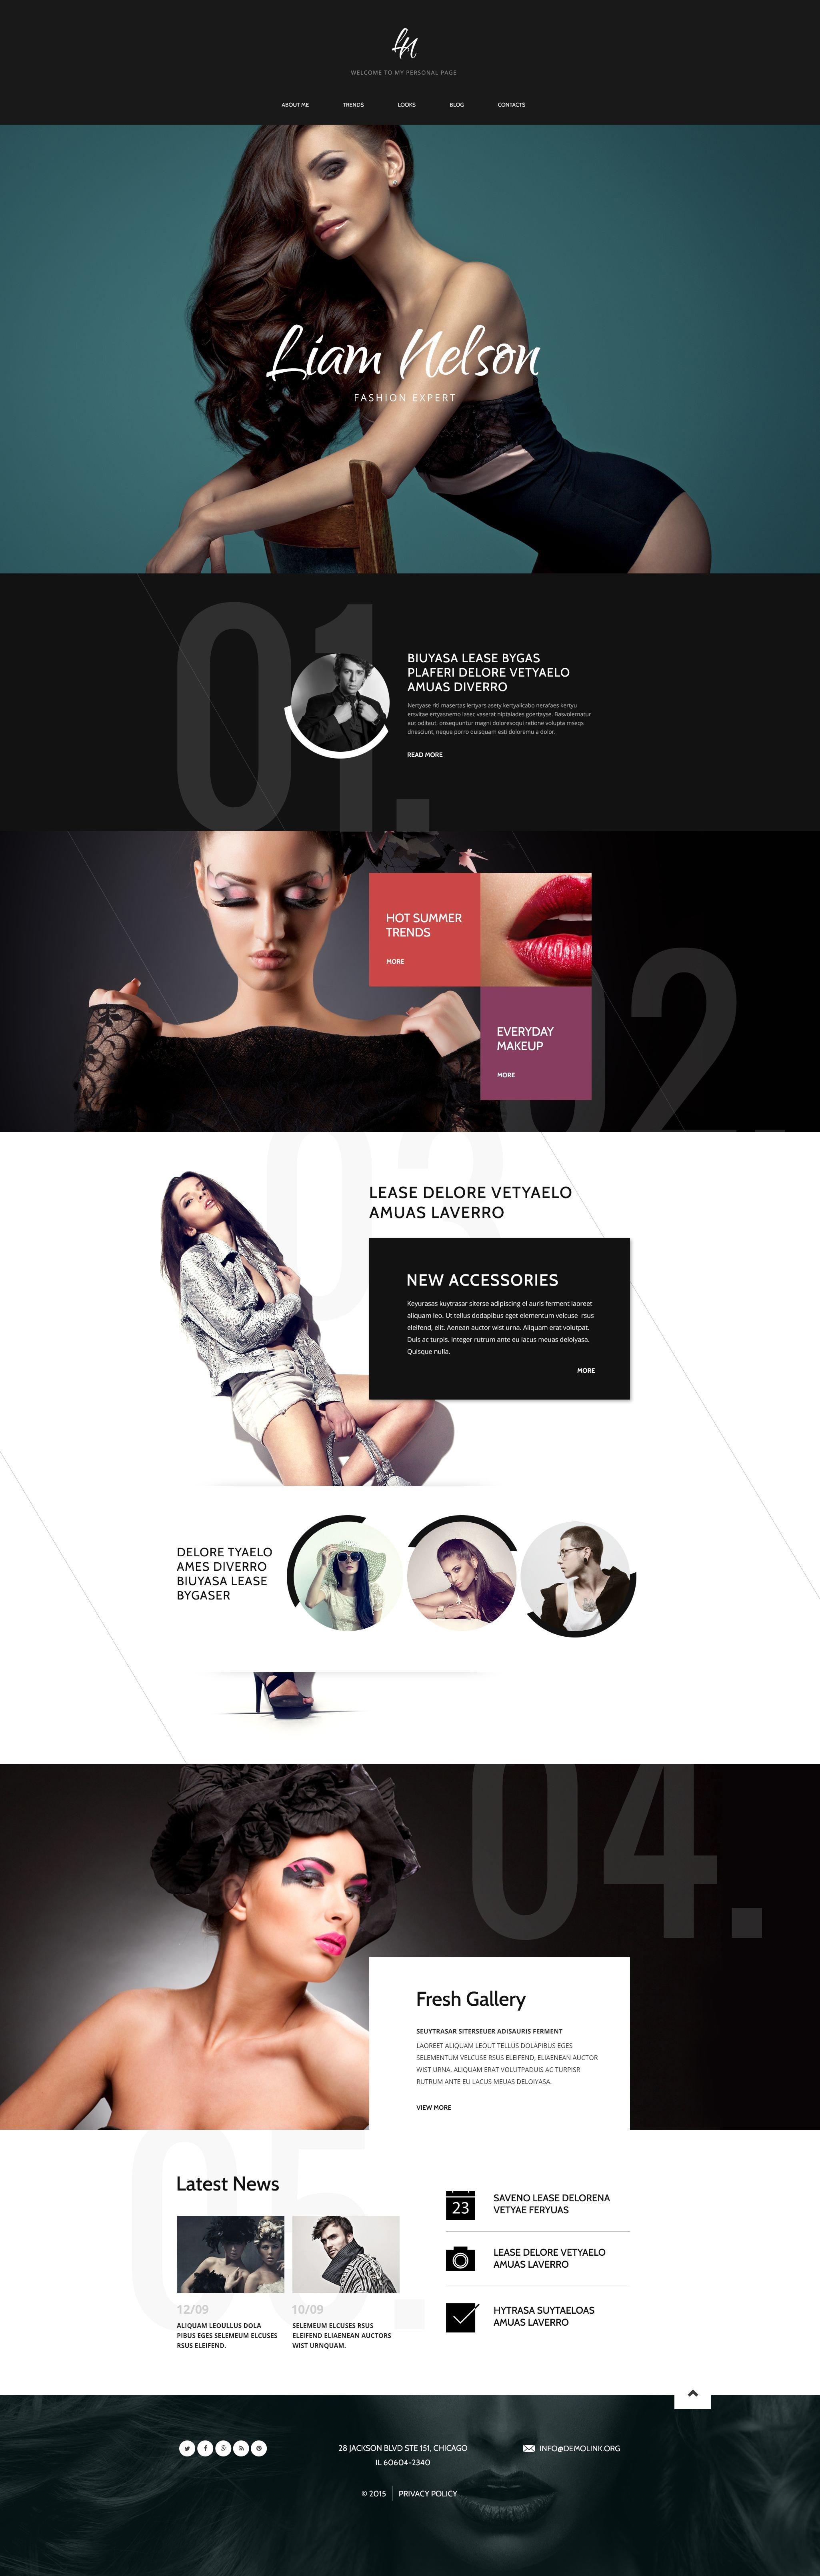 Fashion Expert №53896